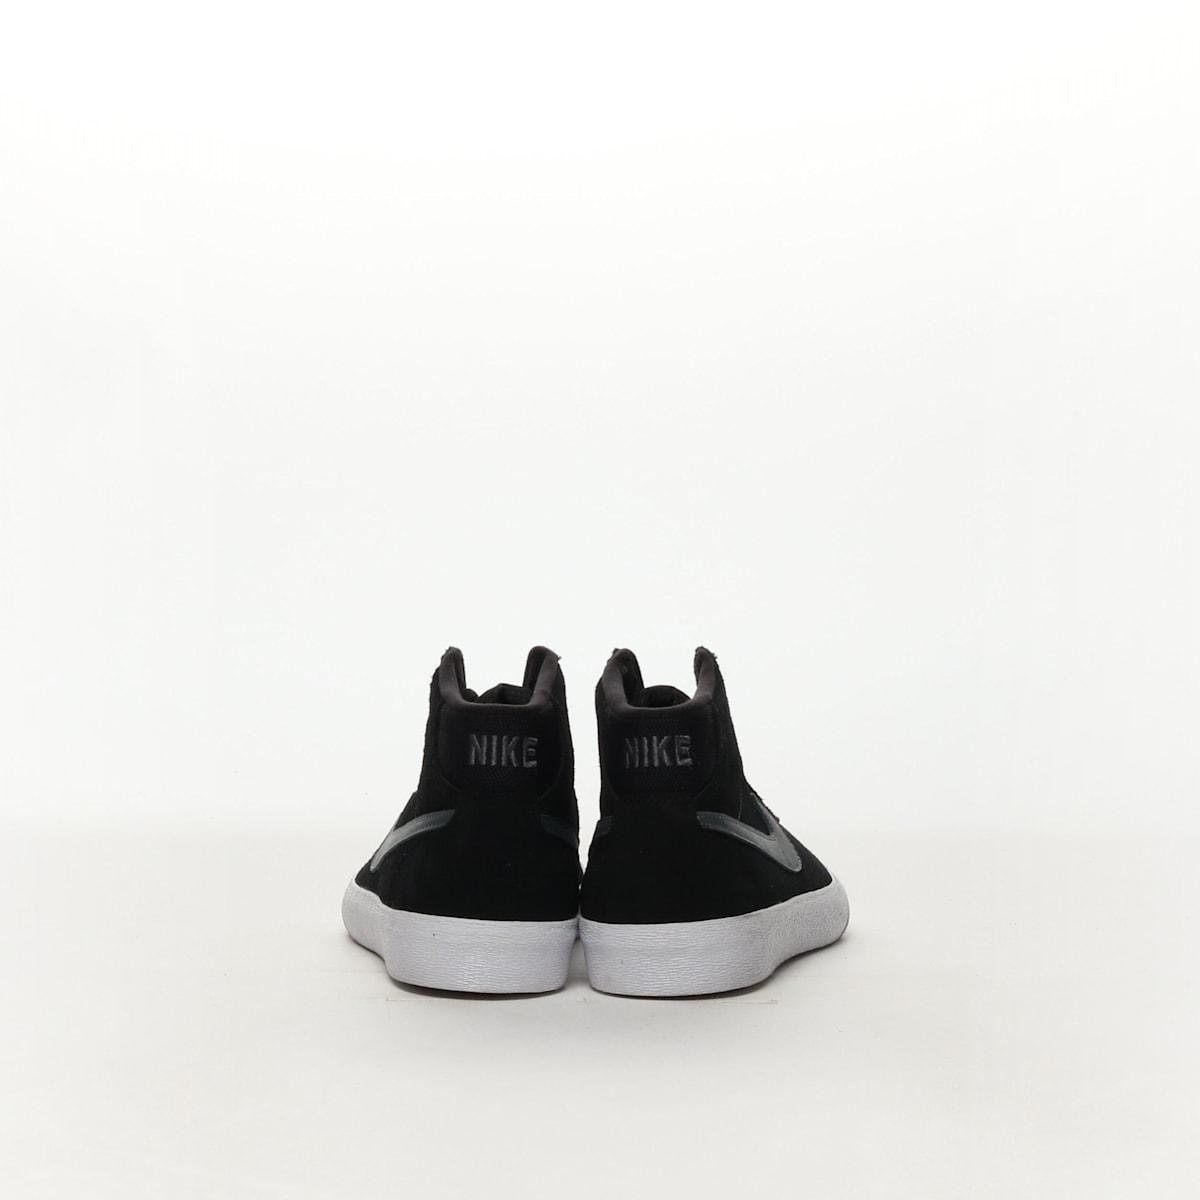 Women s Nike SB Bruin Hi Skateboarding Shoe - BLACK DARK GREY-WHITE d794fd35d